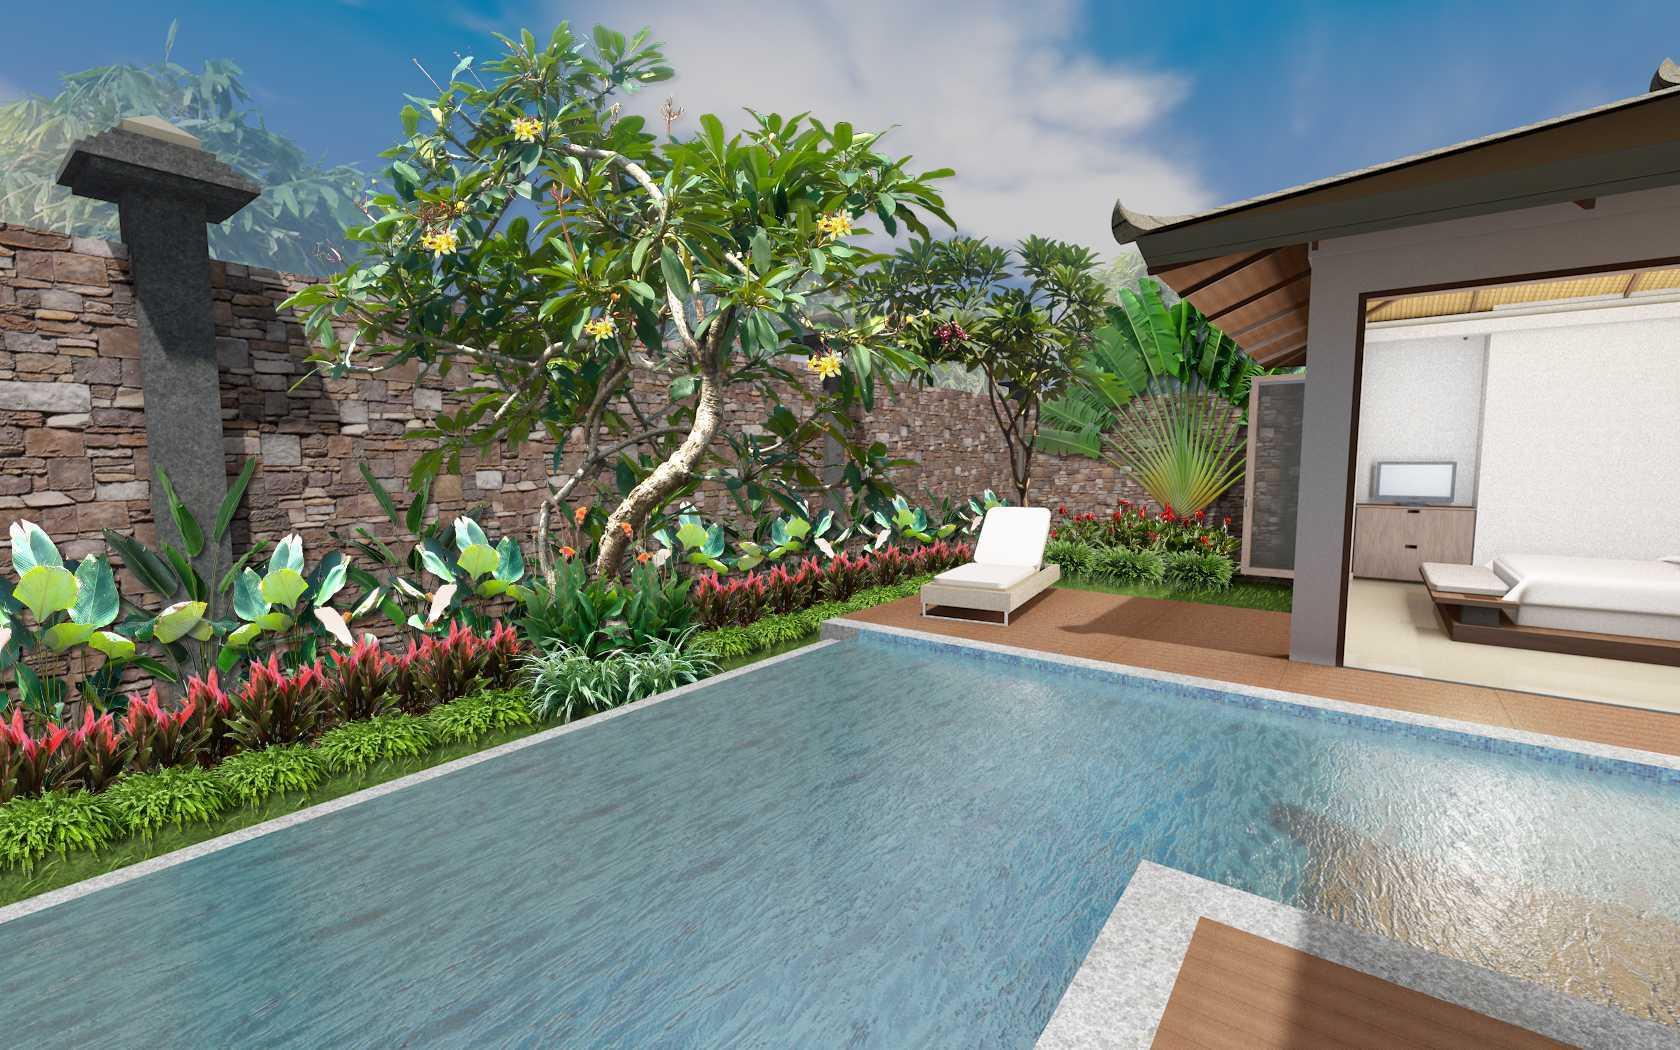 Mta Singhasari Resort Malang, East Java Malang, East Java Pool Landscape Treatment   8785